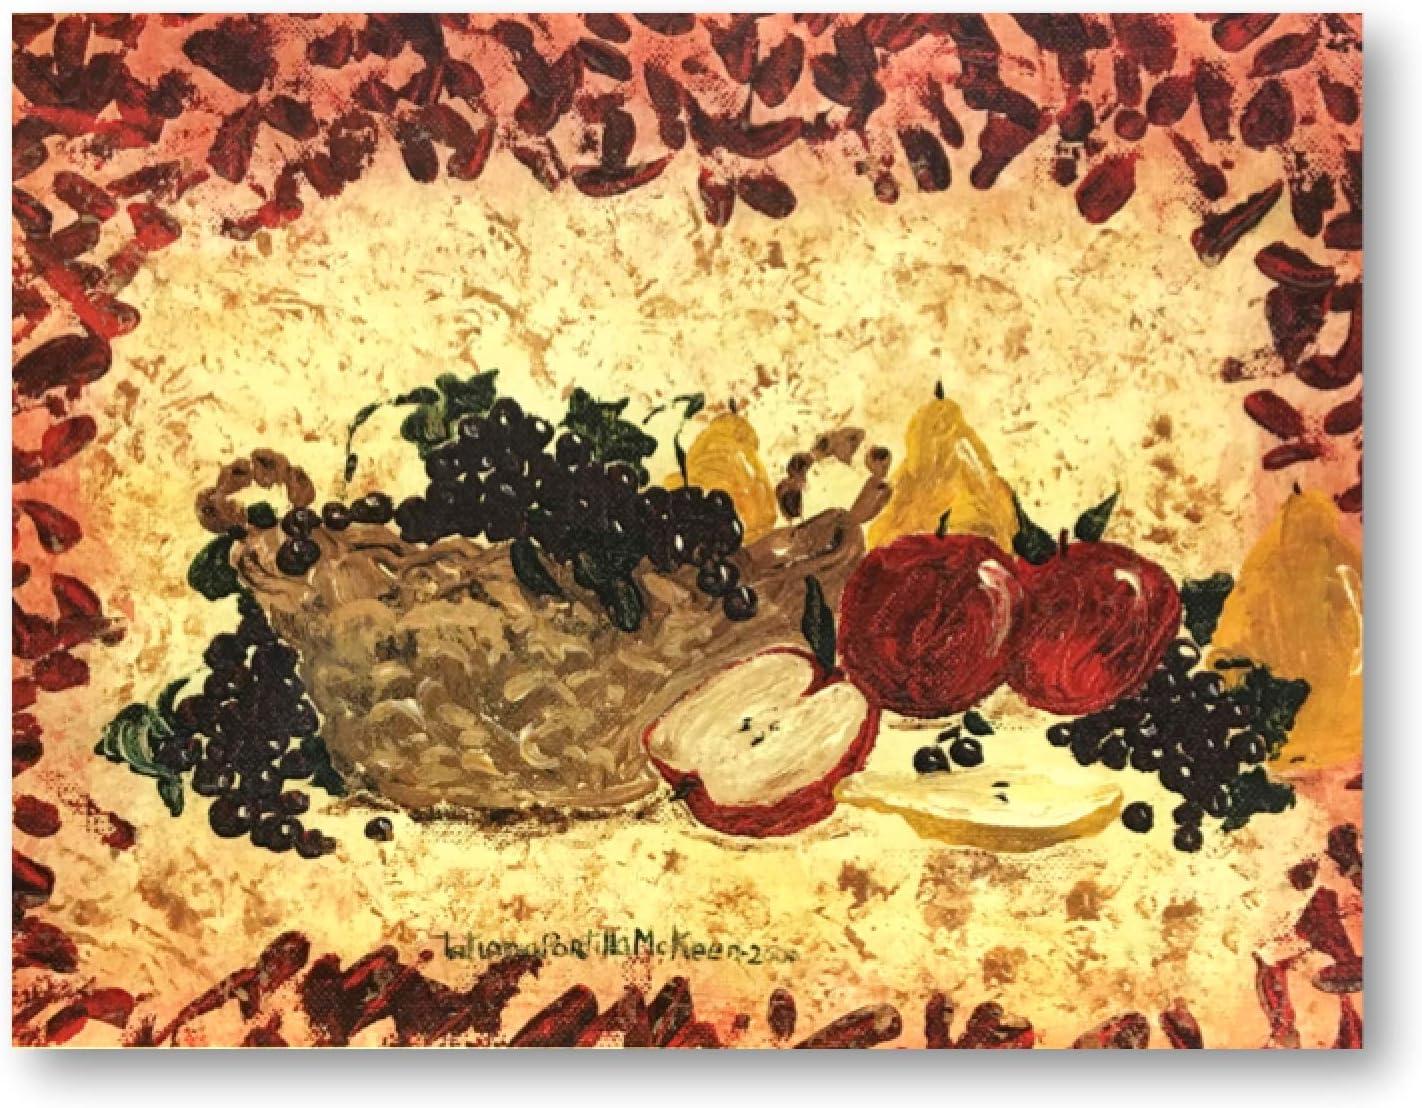 Best Kitchen Pictures GIF Ideas Unique Colorful Vintage WallDeco Fruit Basket Red Border Apples Grapes Candle tatianaslabel 11X14 Num 24